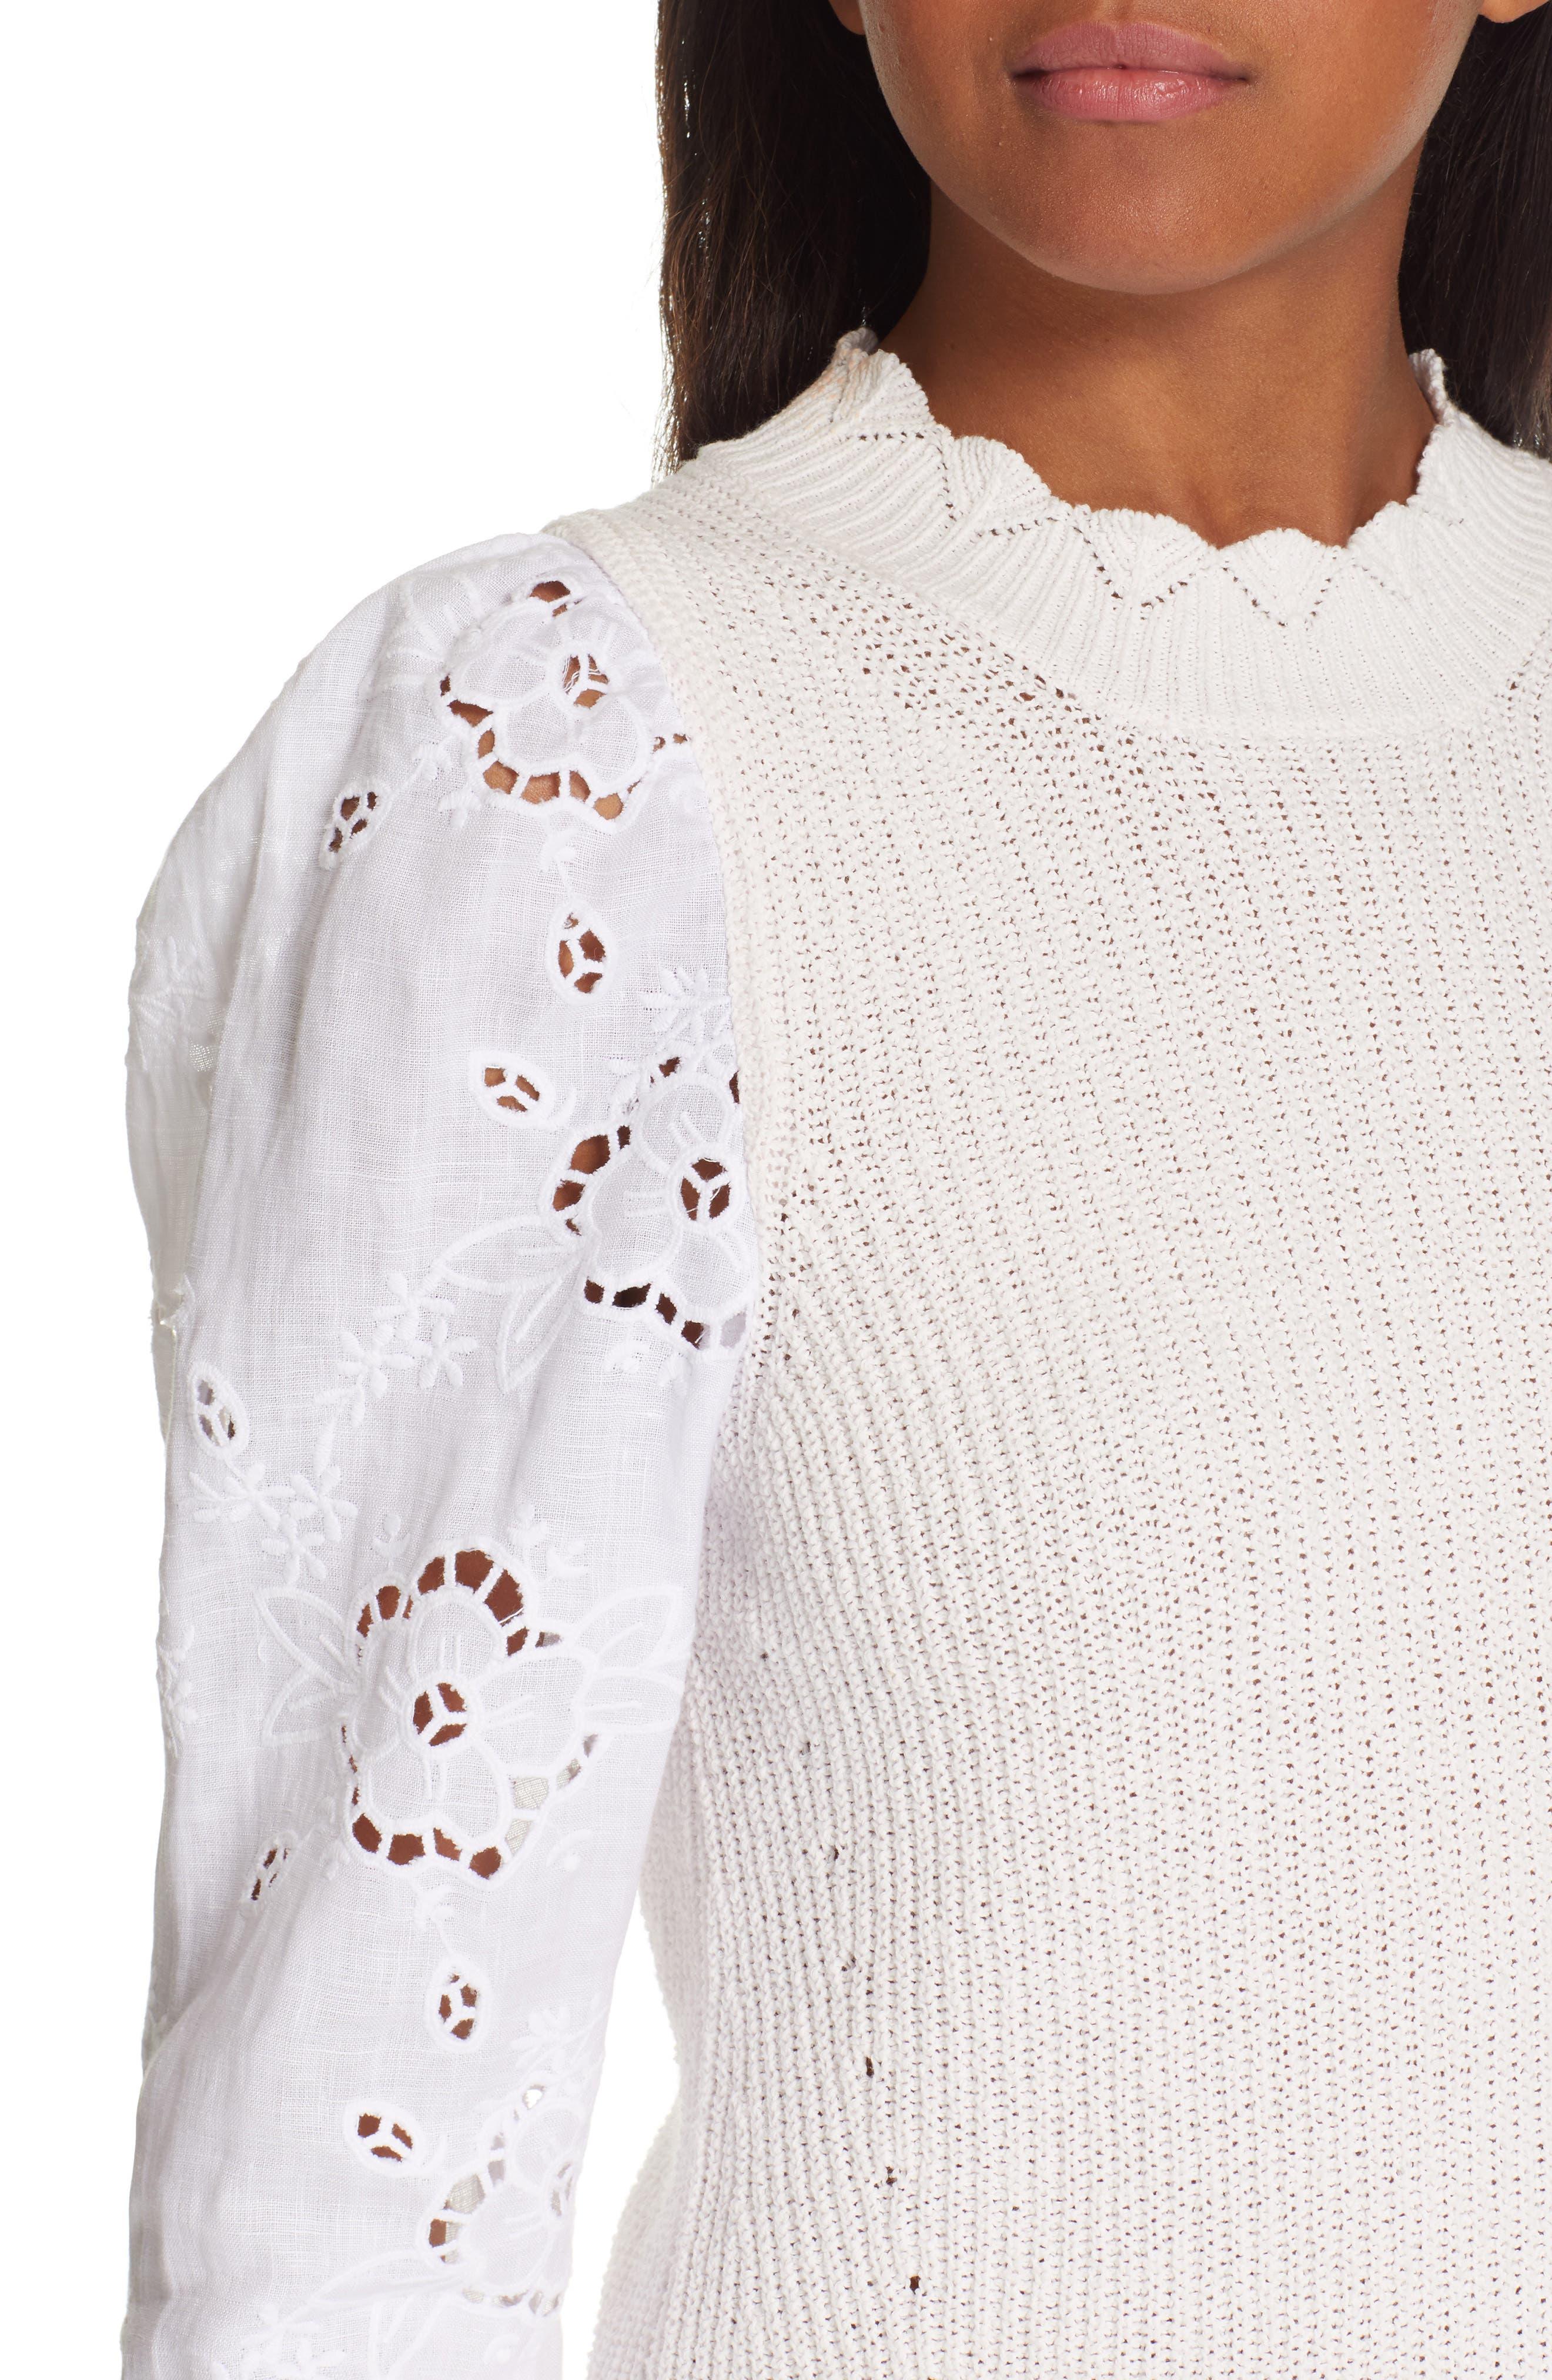 REBECCA TAYLOR, Mix Media Eyelet Sleeve Cotton Sweater, Alternate thumbnail 4, color, WASHED PETAL